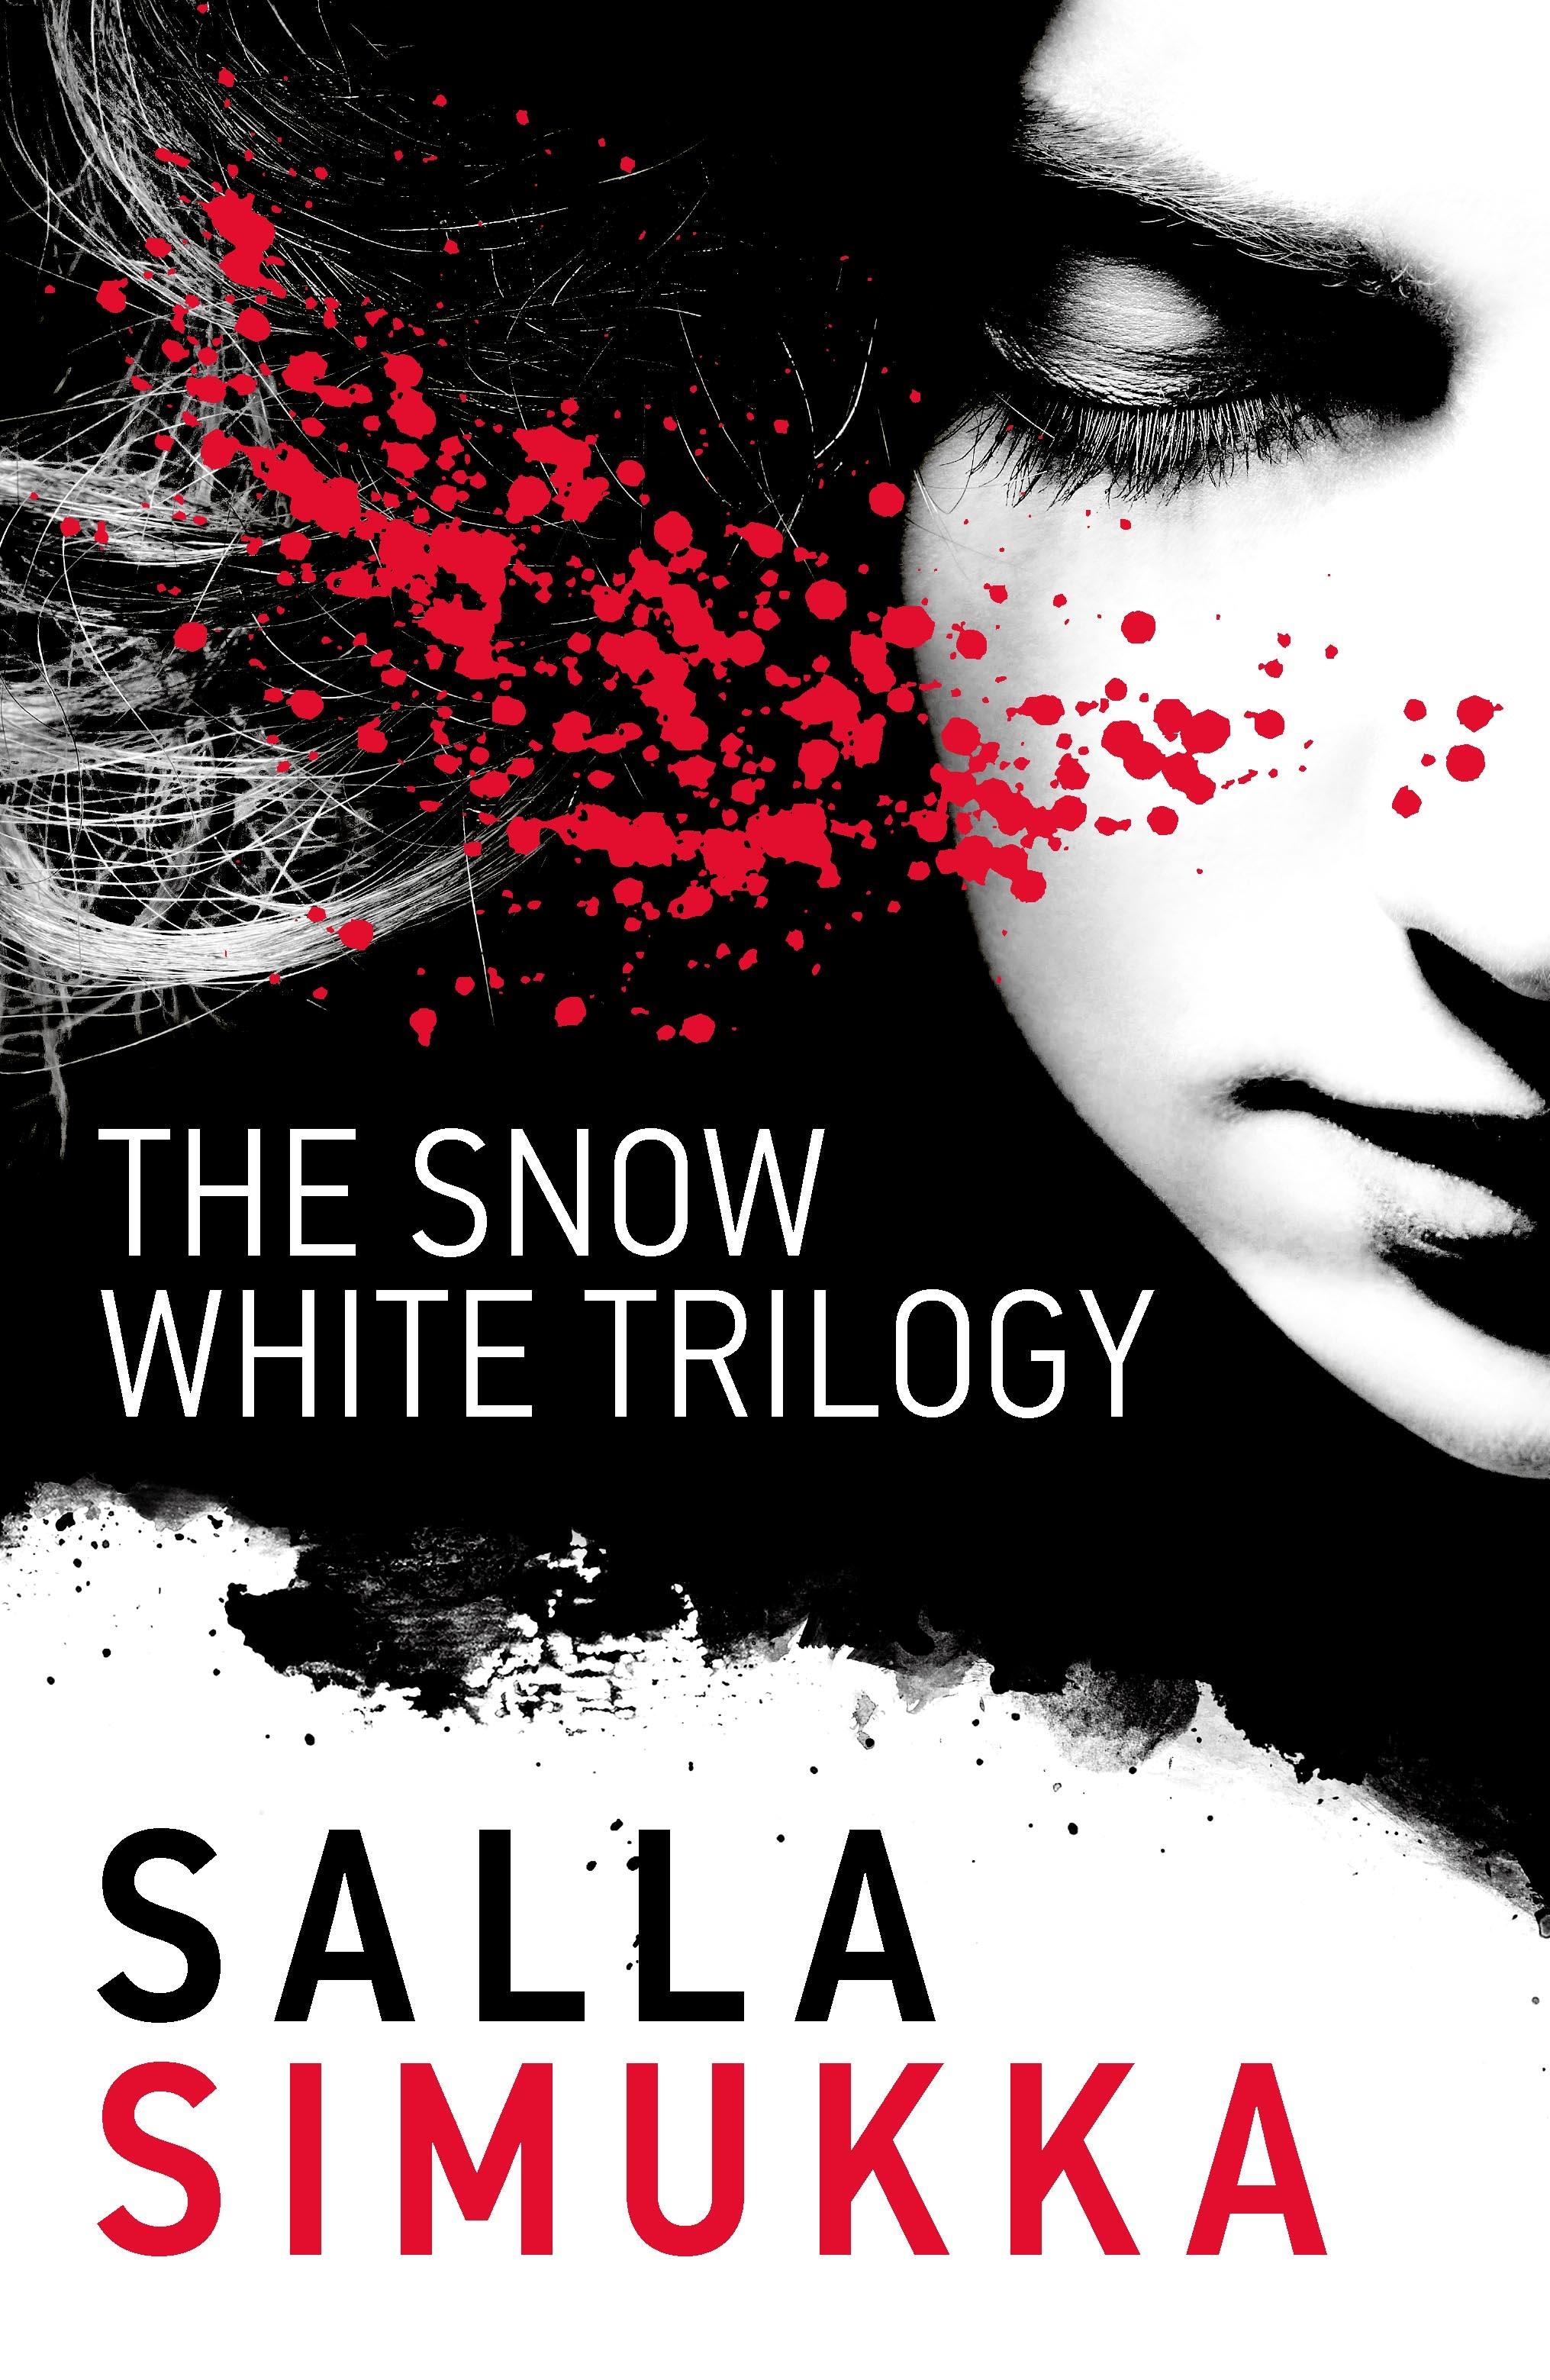 The Snow White Trilogy by Salla Simukka